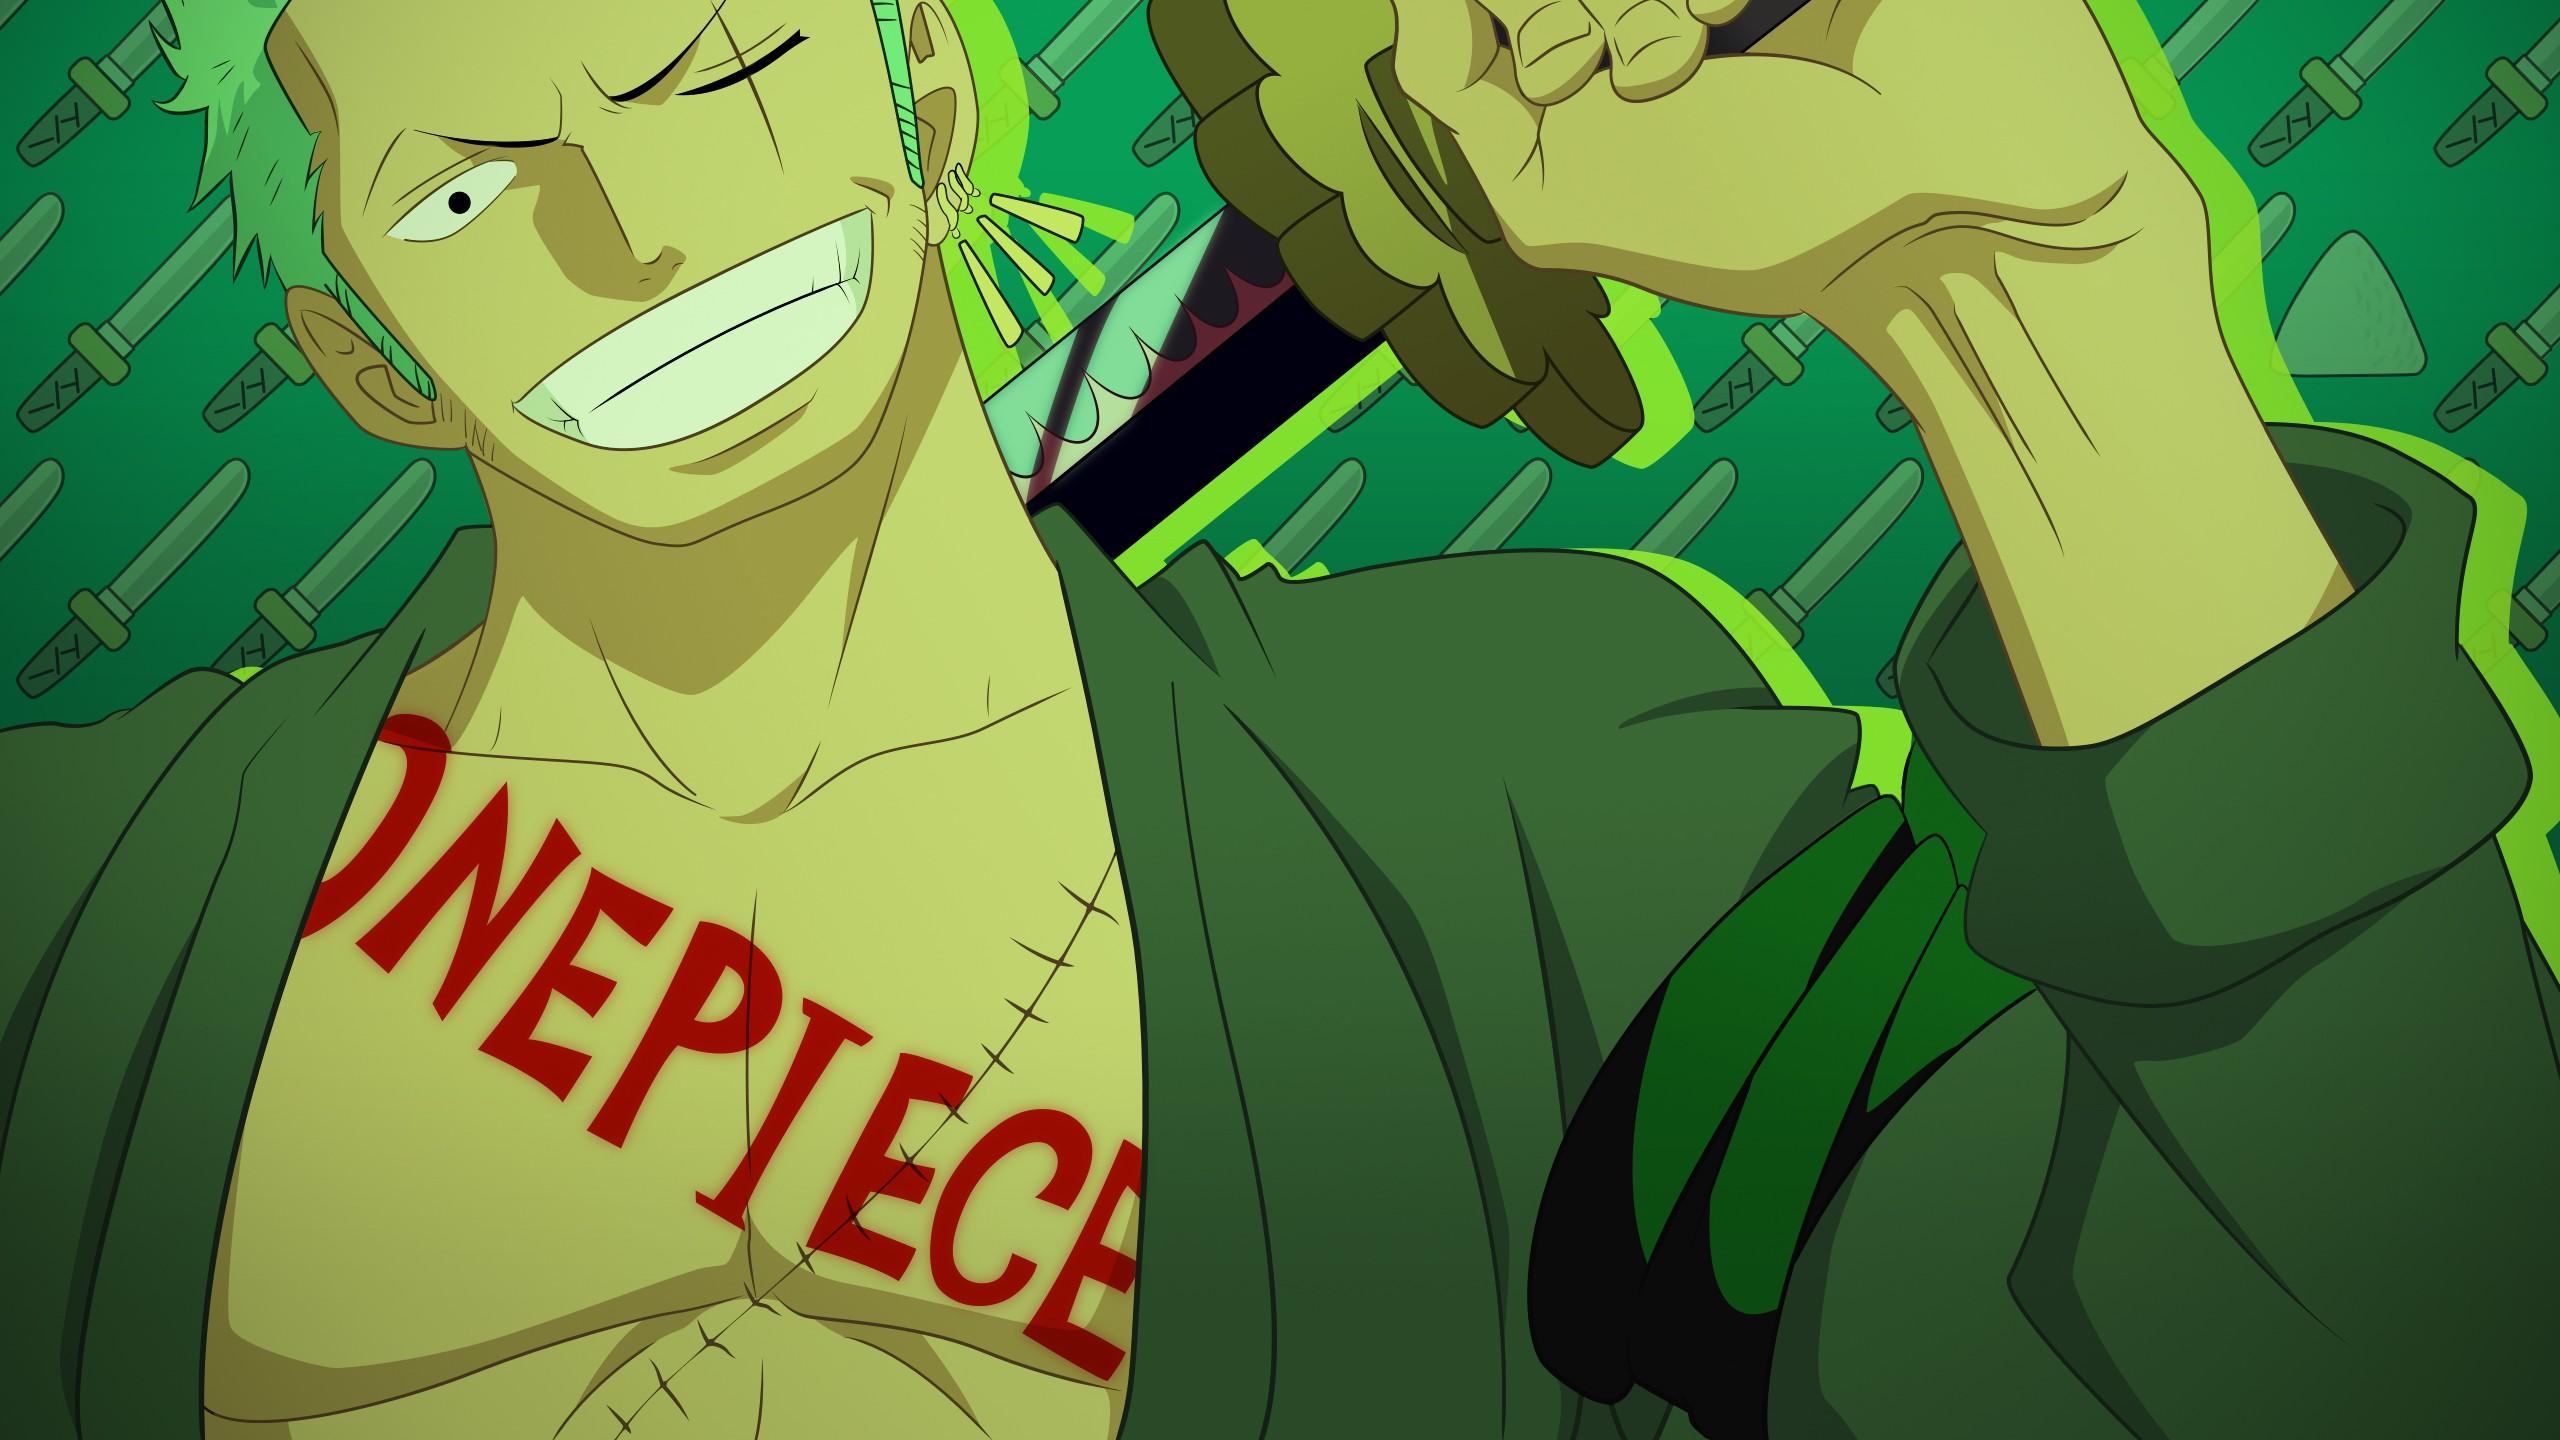 Wallpaper Ilustrasi Anime Hijau Gambar Kartun Satu Potong Roronoa Zoro Screenshot Buku Komik Fiksi 2560x1440 Paranoiddollv2 261869 Hd Wallpapers Wallhere